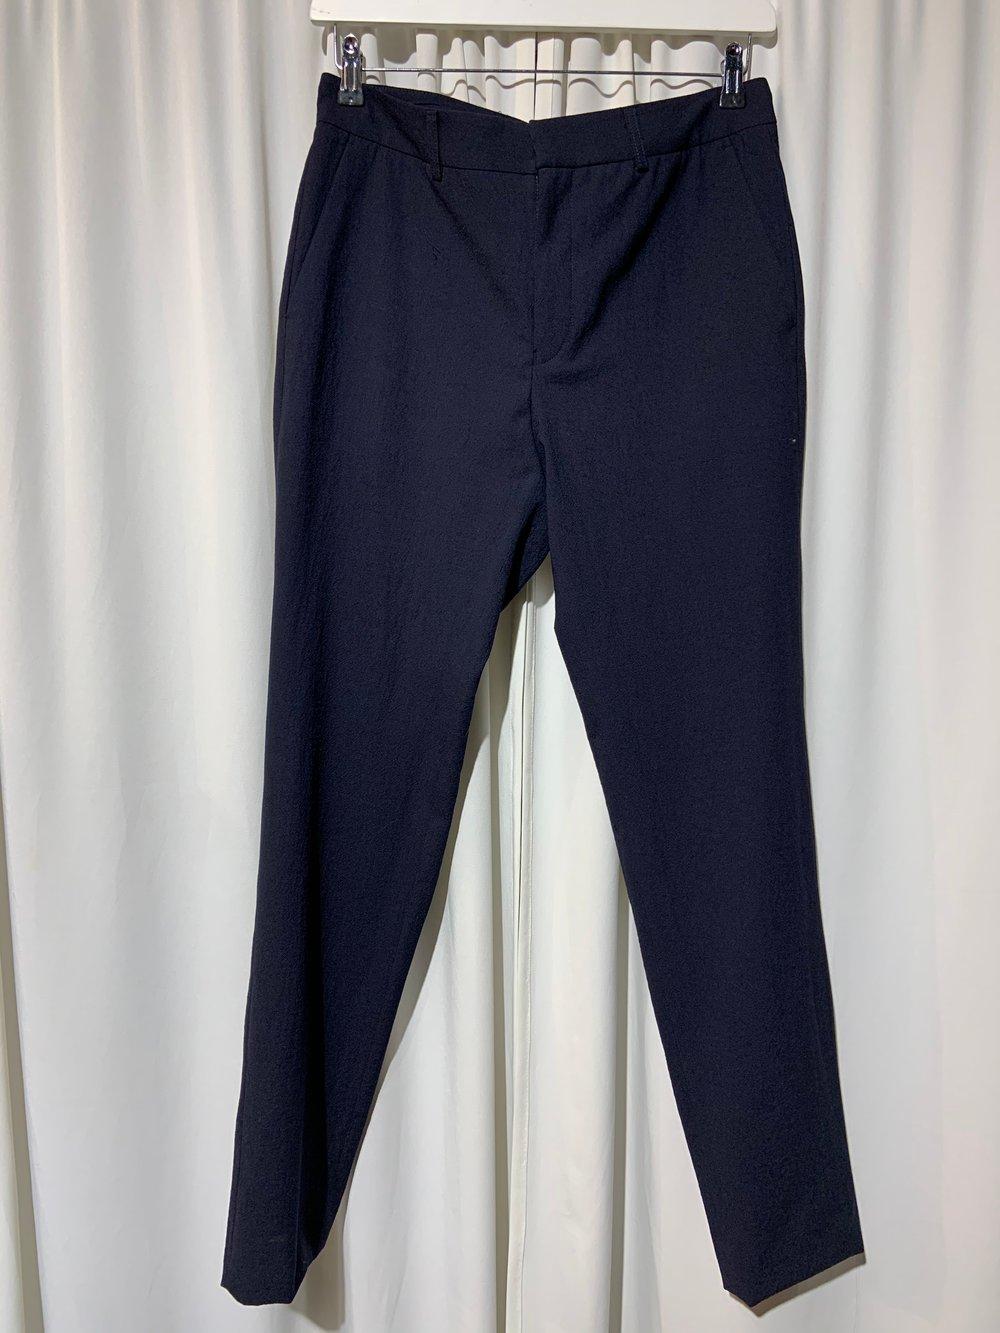 Image of DELIKATESSEN linen trousers